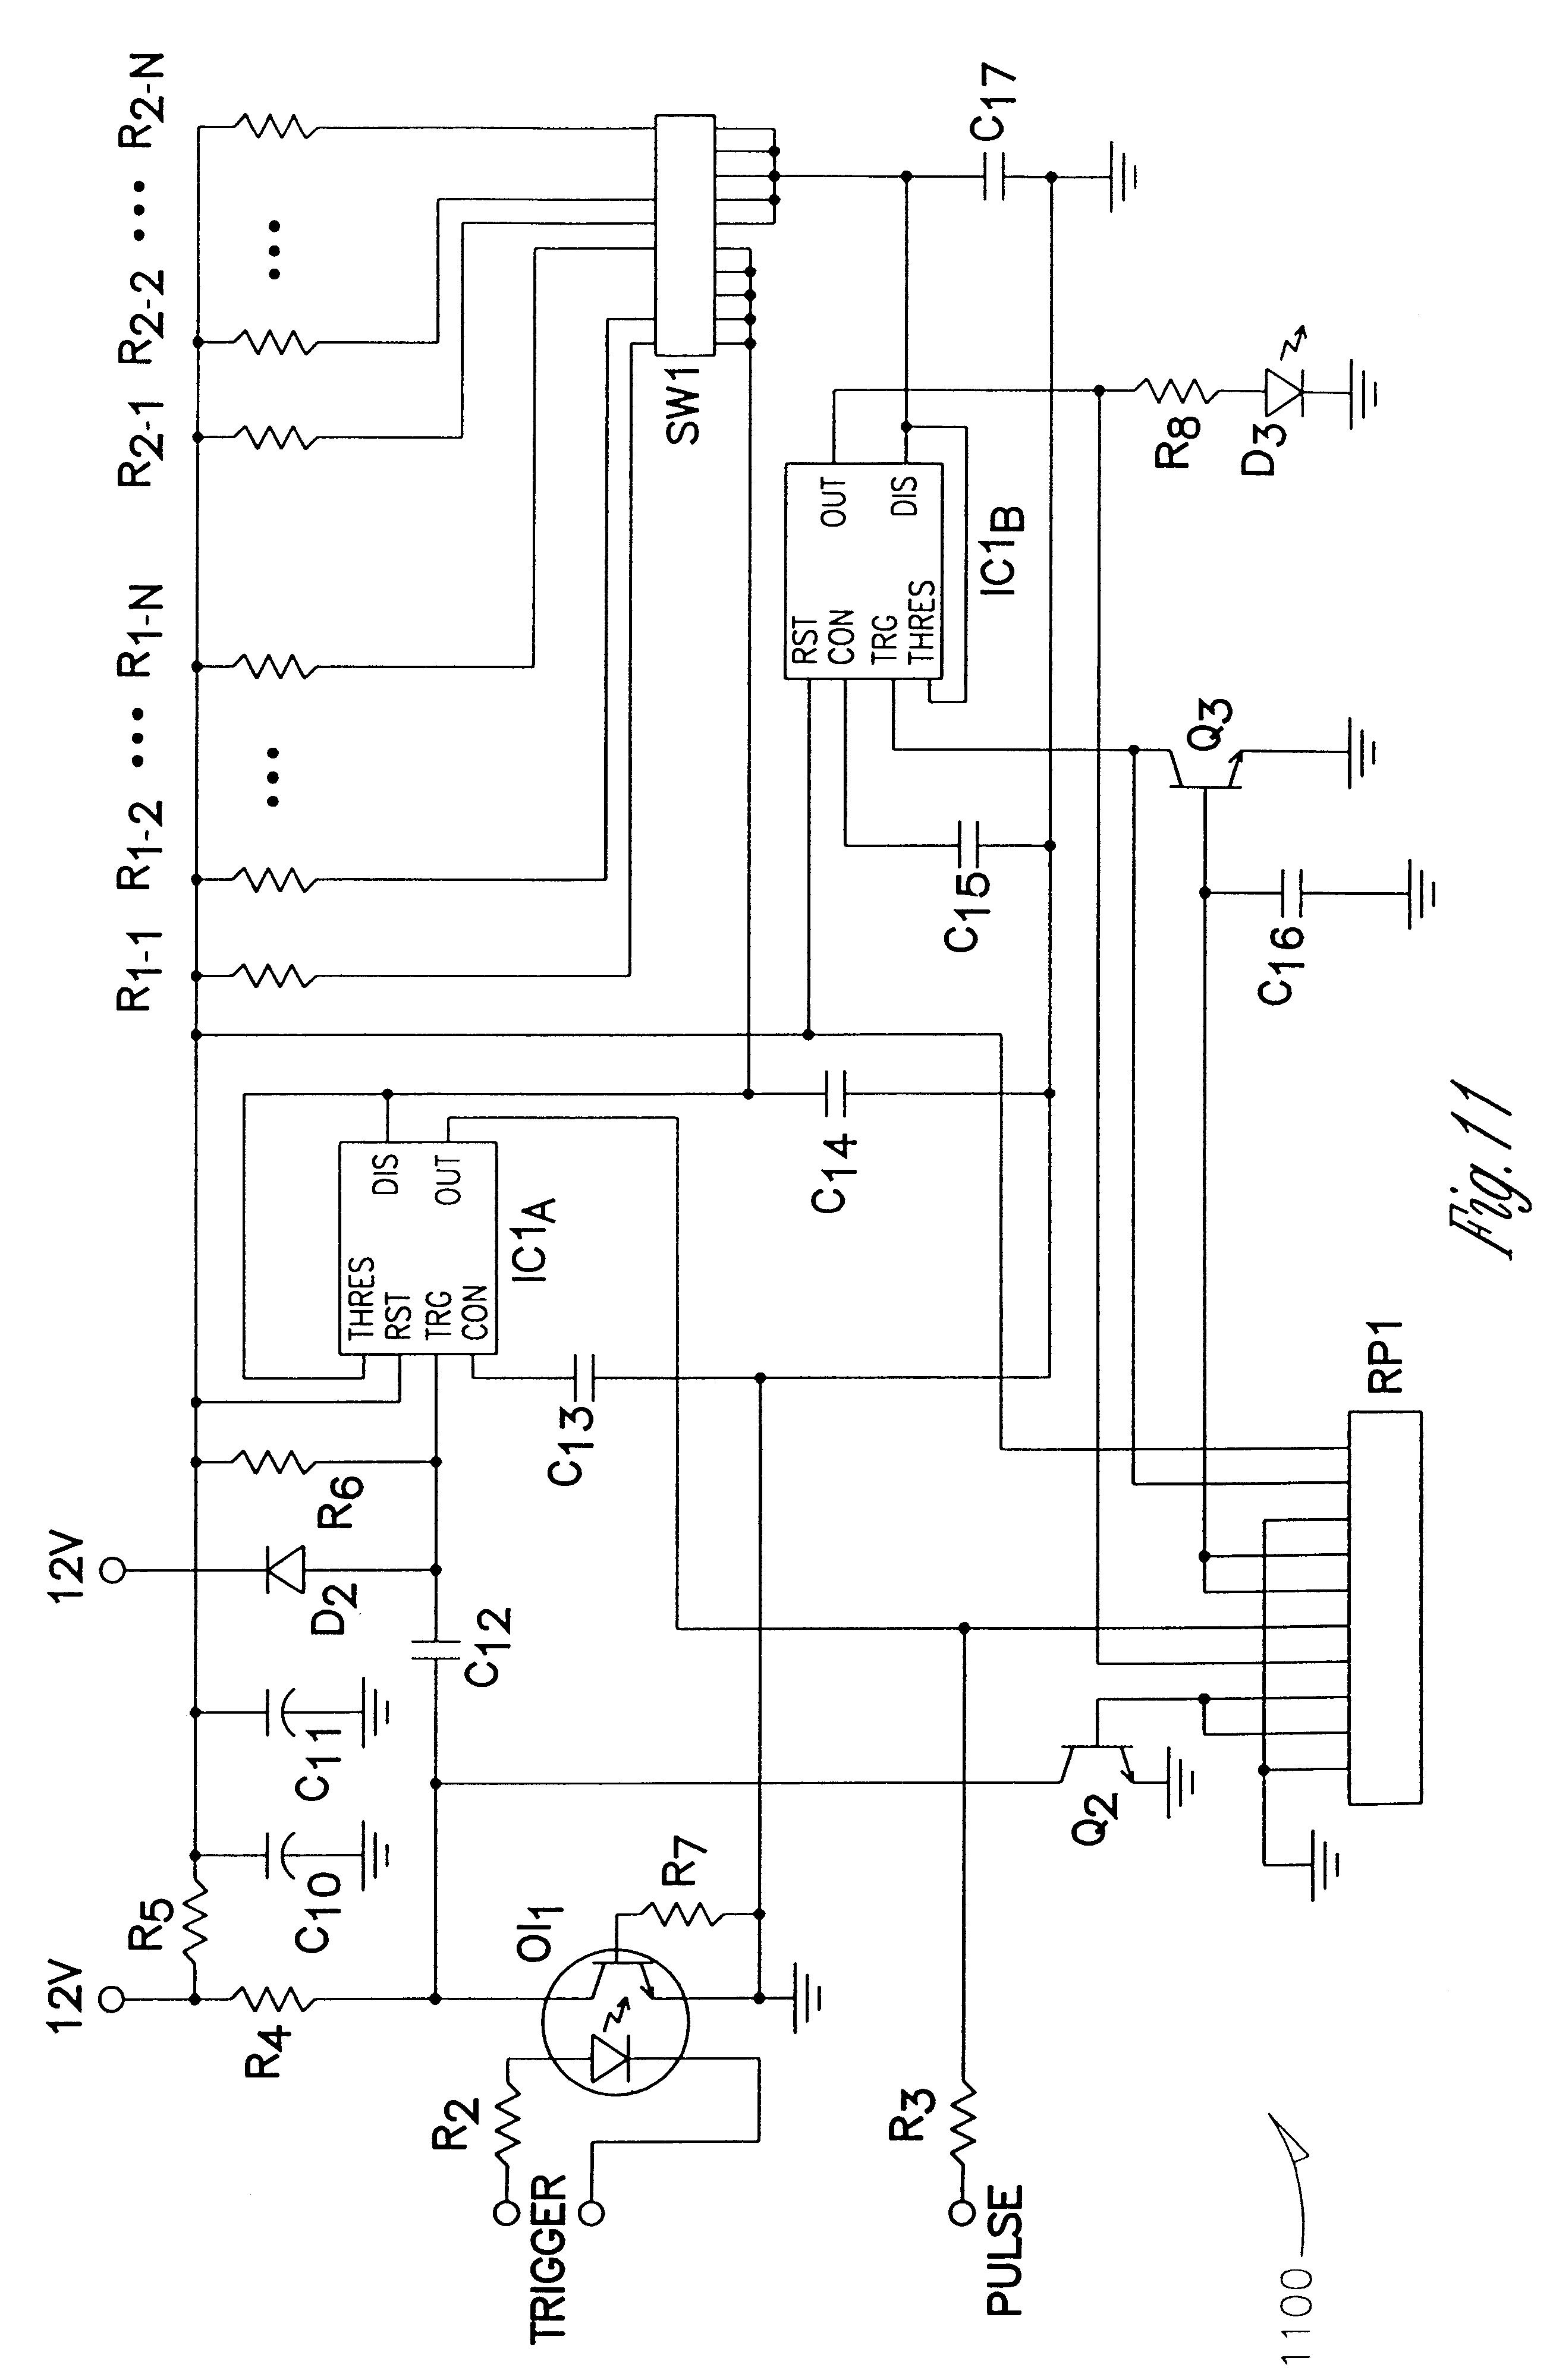 2000 international 4700 wiring diagram 4700 international truck wiring  diagrams international 4700 wiring diagram 2001 international